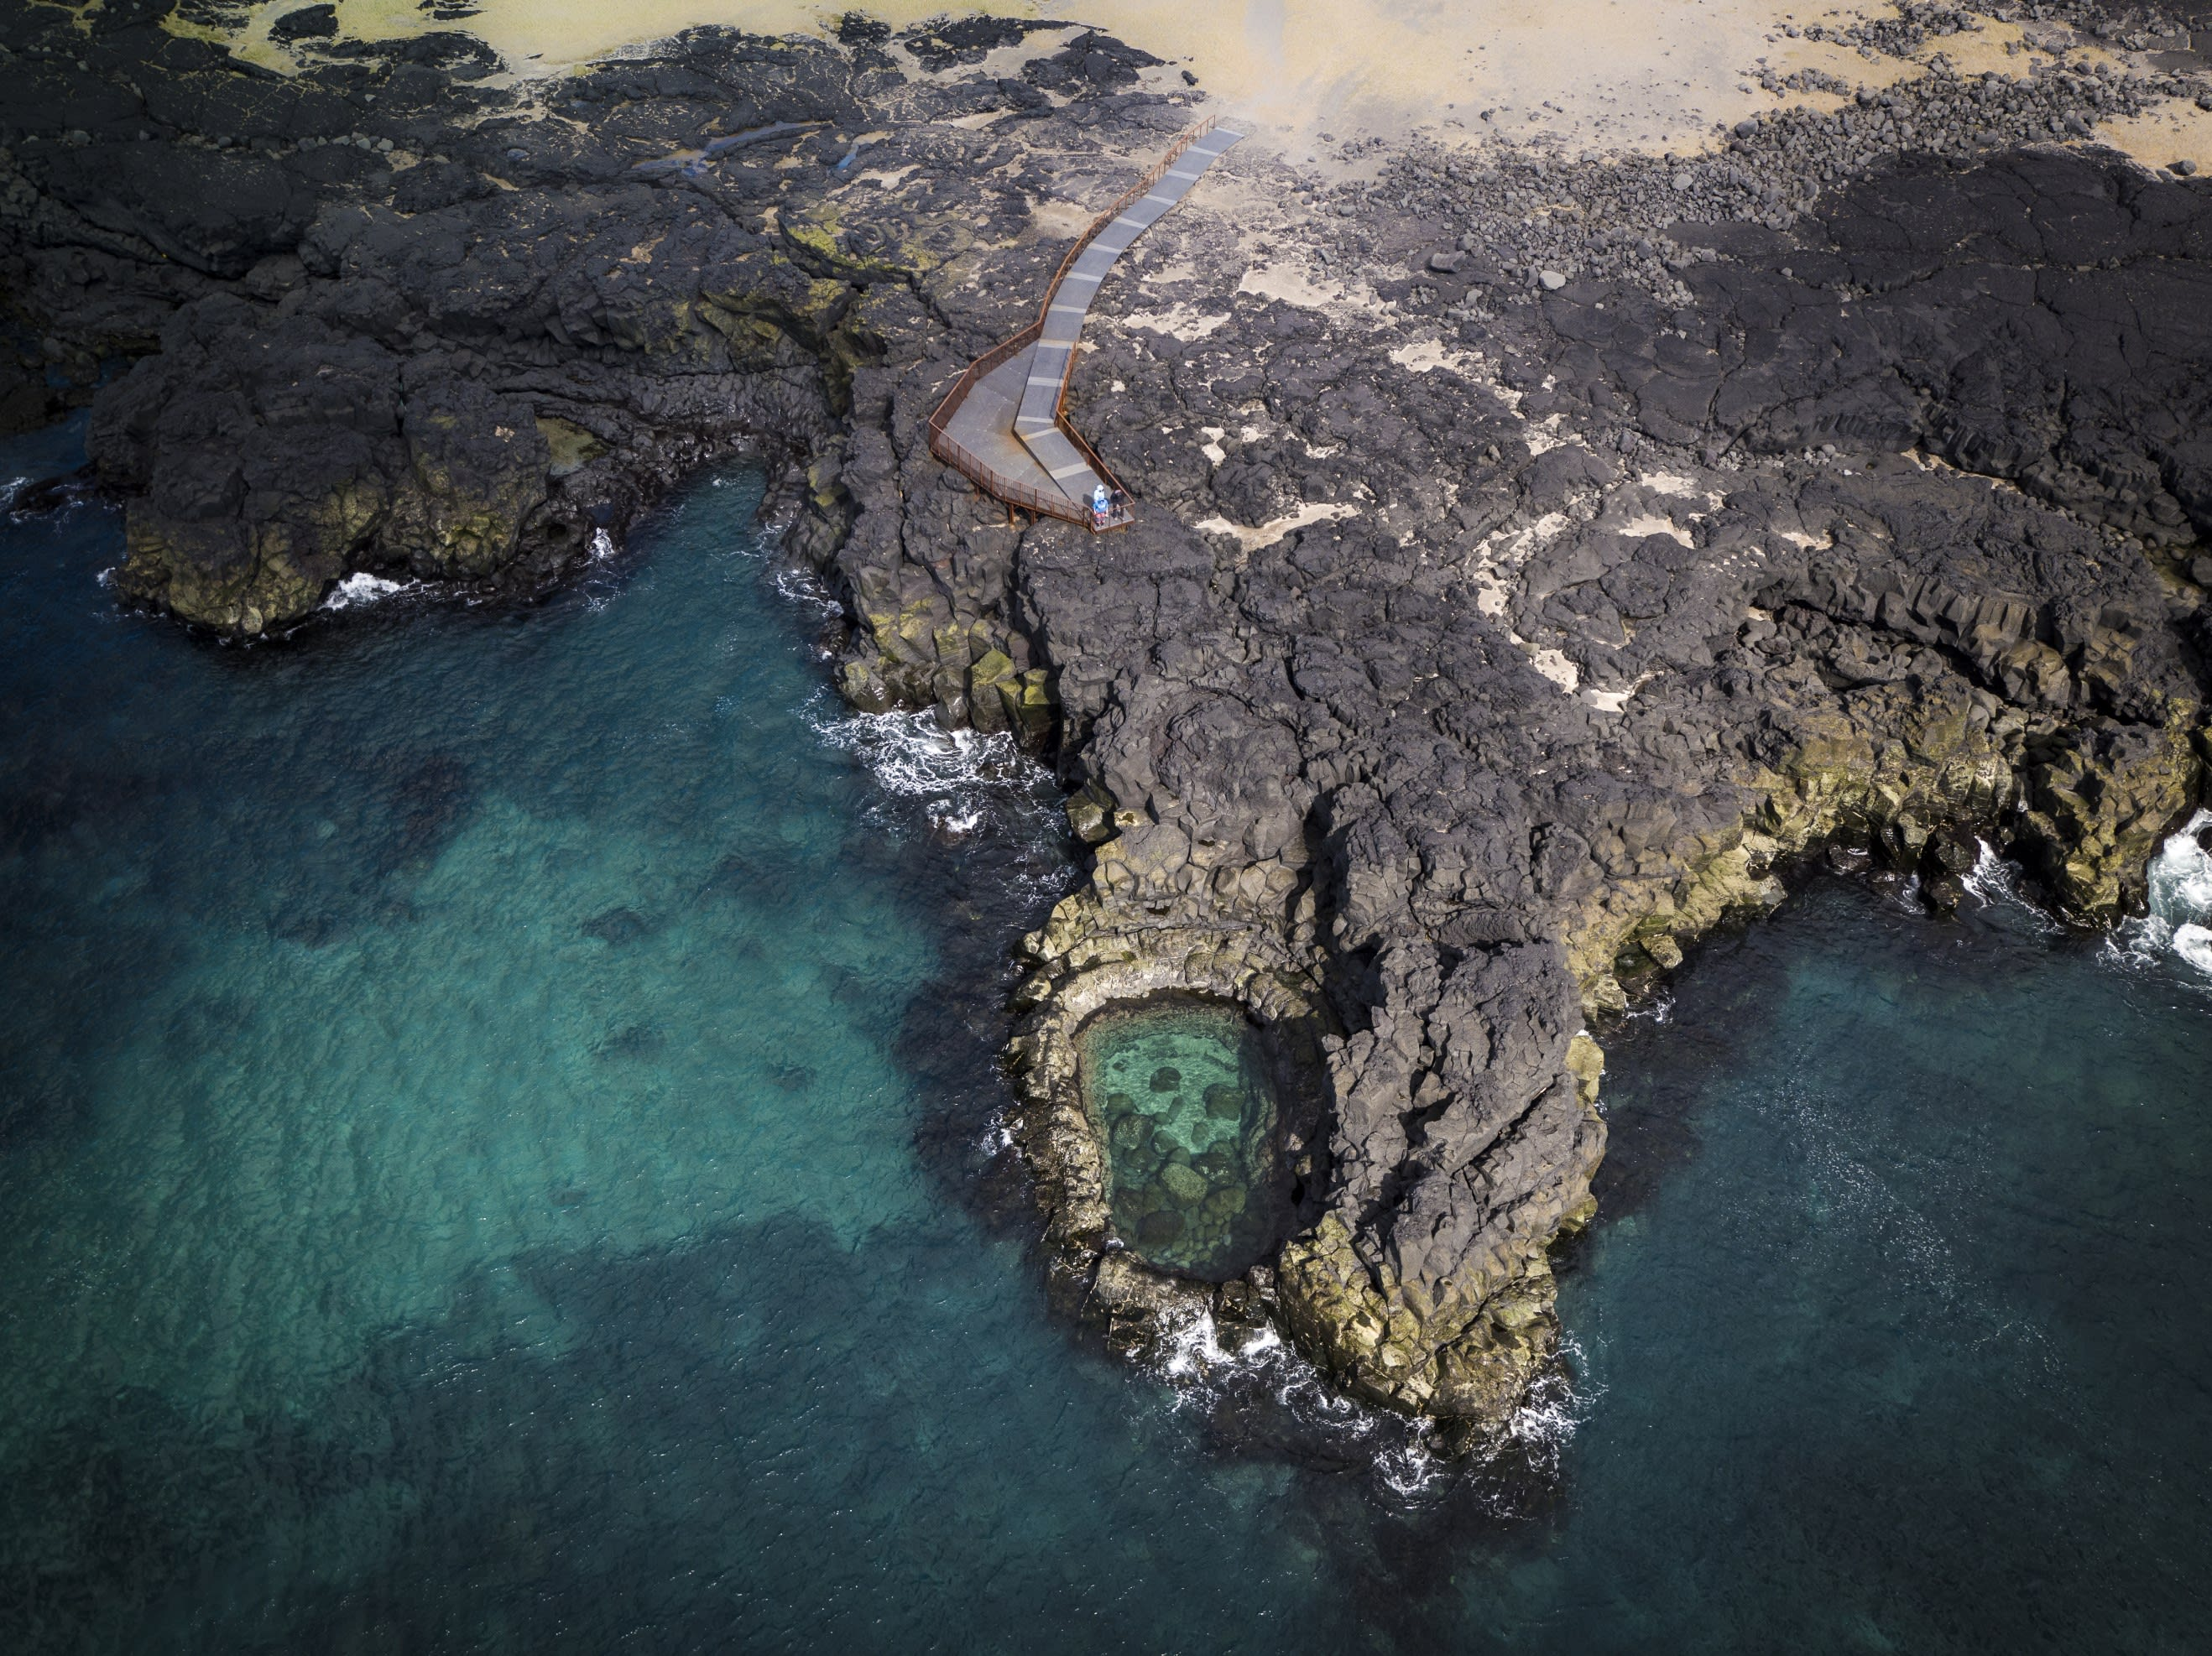 Brimketill, a small body of water contained in Iceland's rocky shoreline